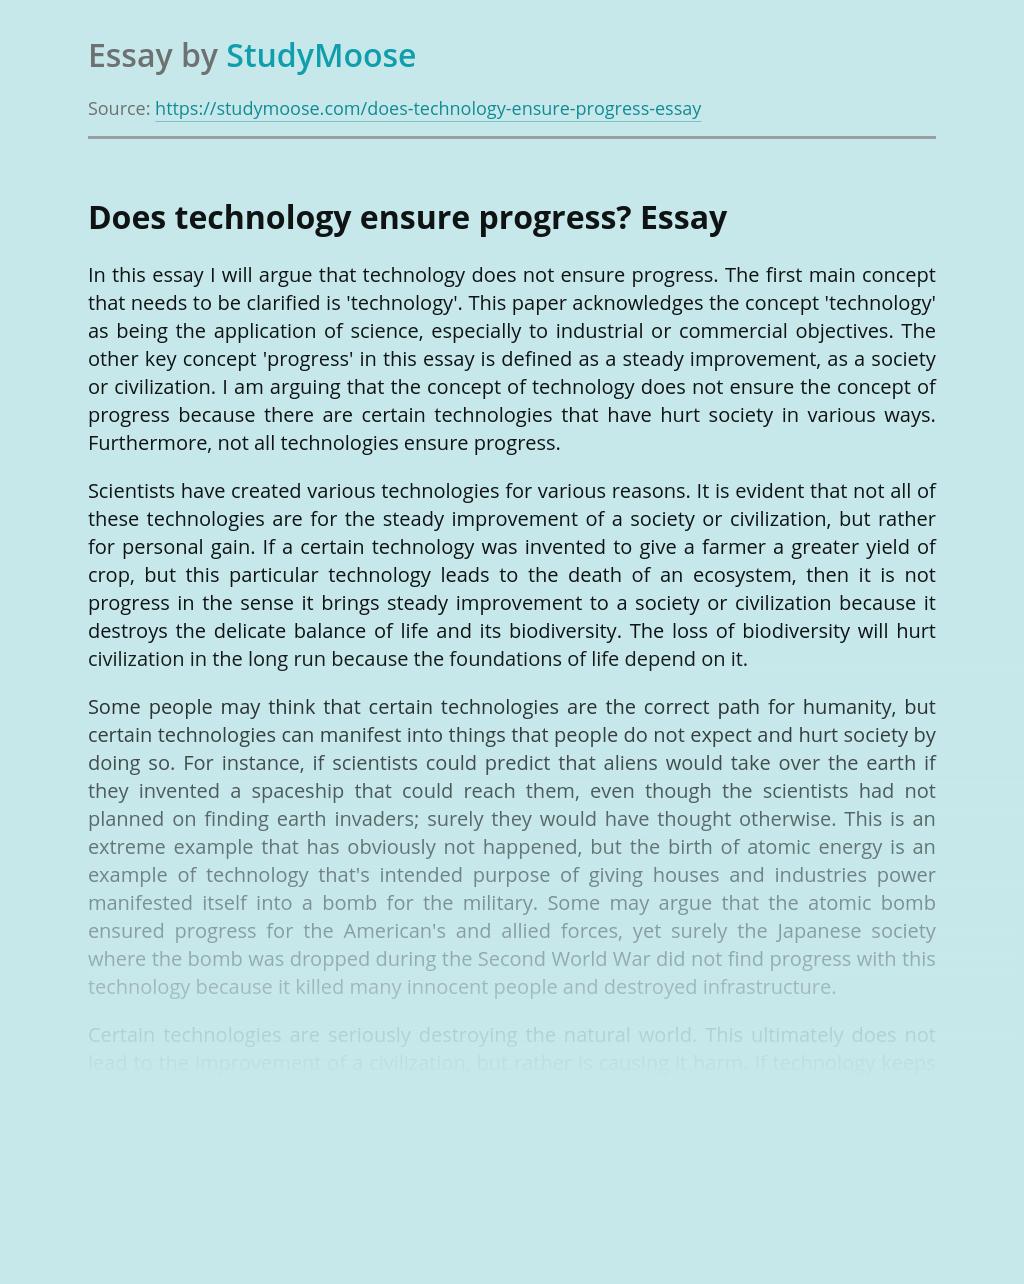 Does technology ensure progress?